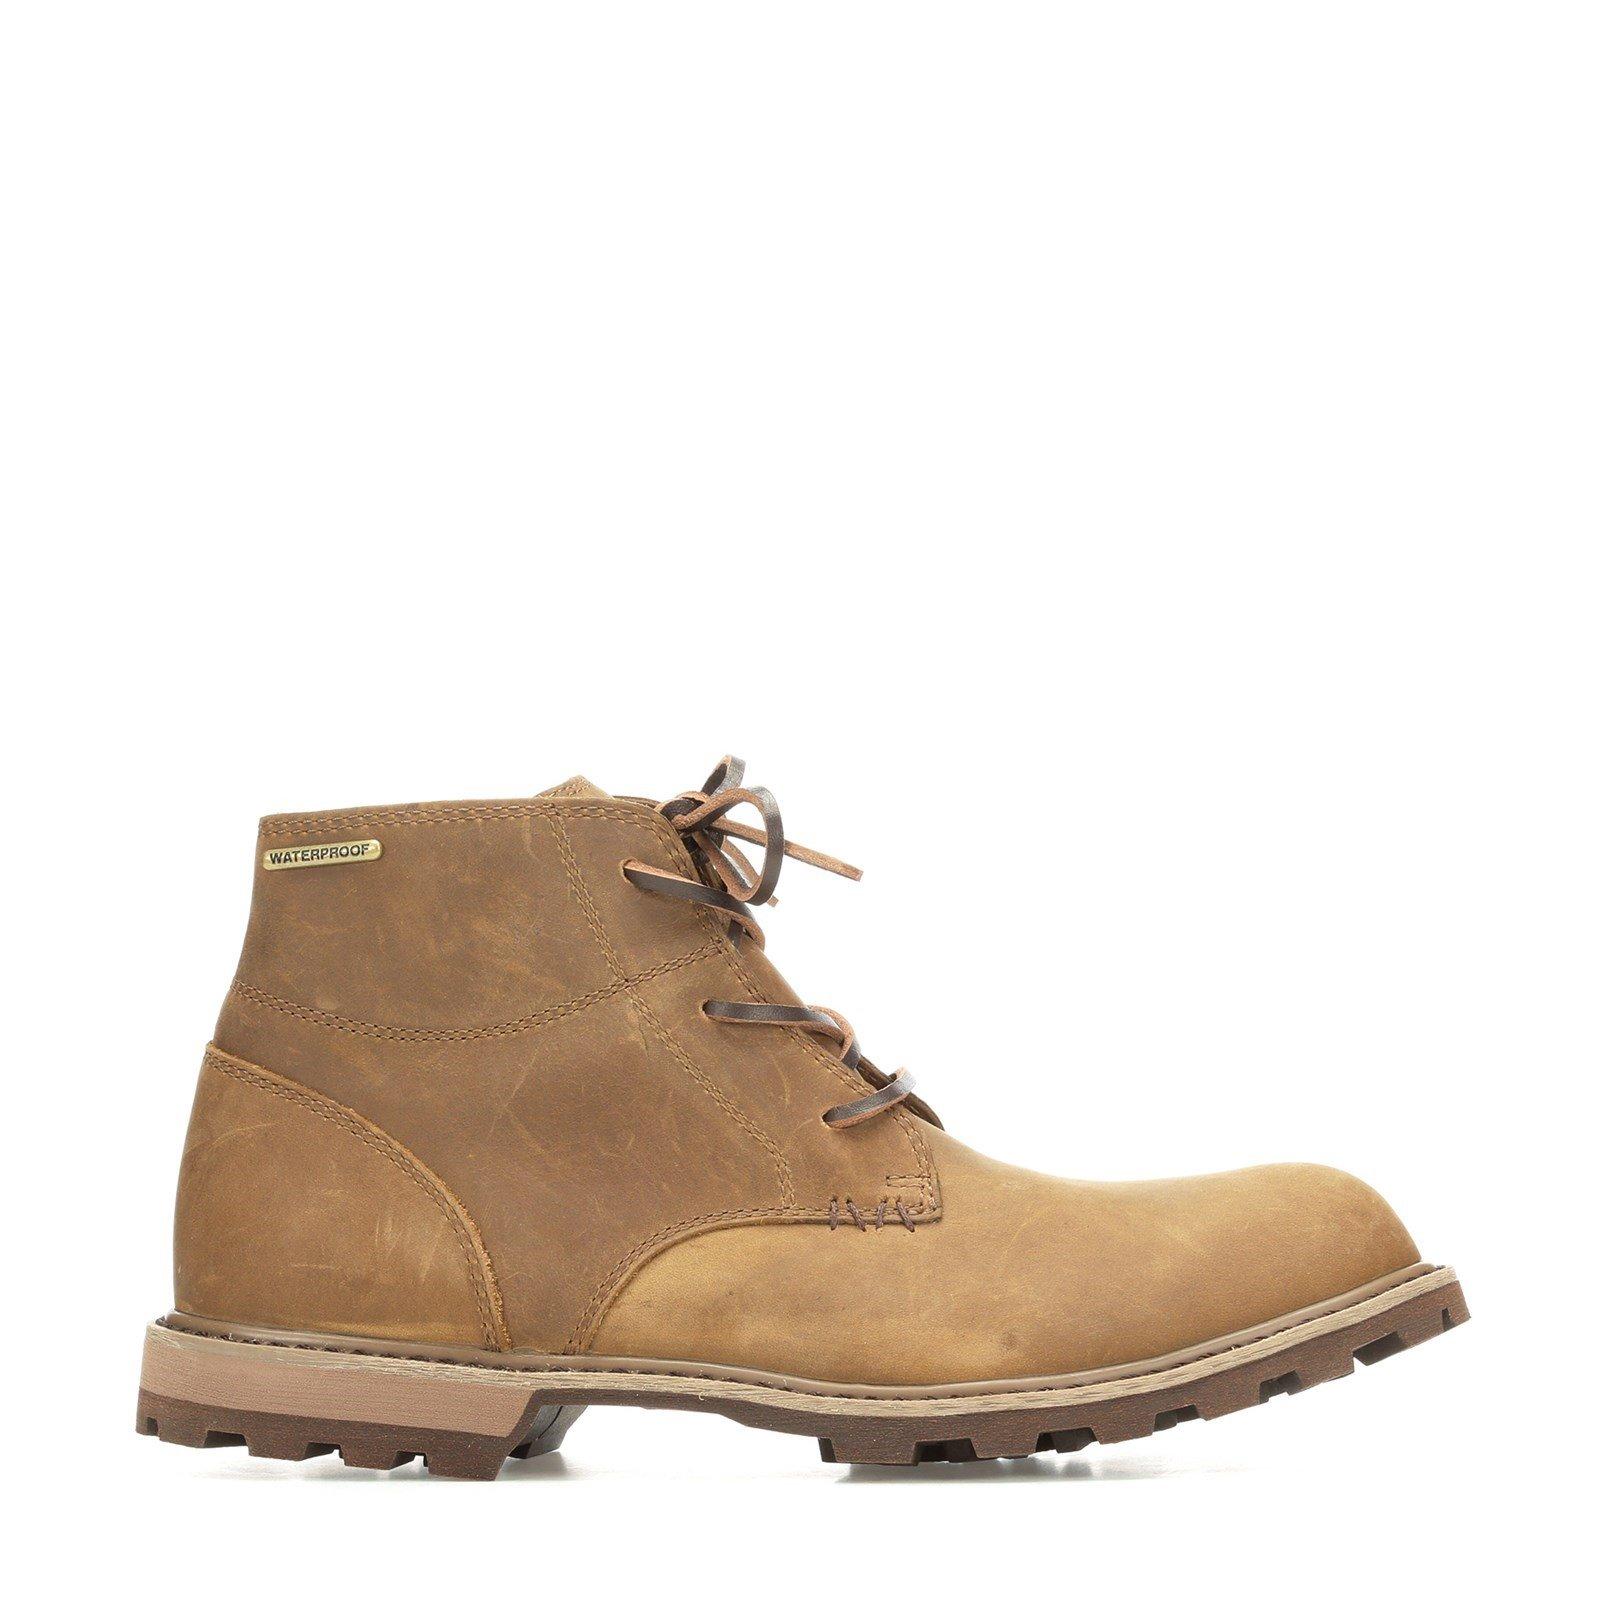 Muck Boots Men's Freeman Boot 31761 - Tan 9